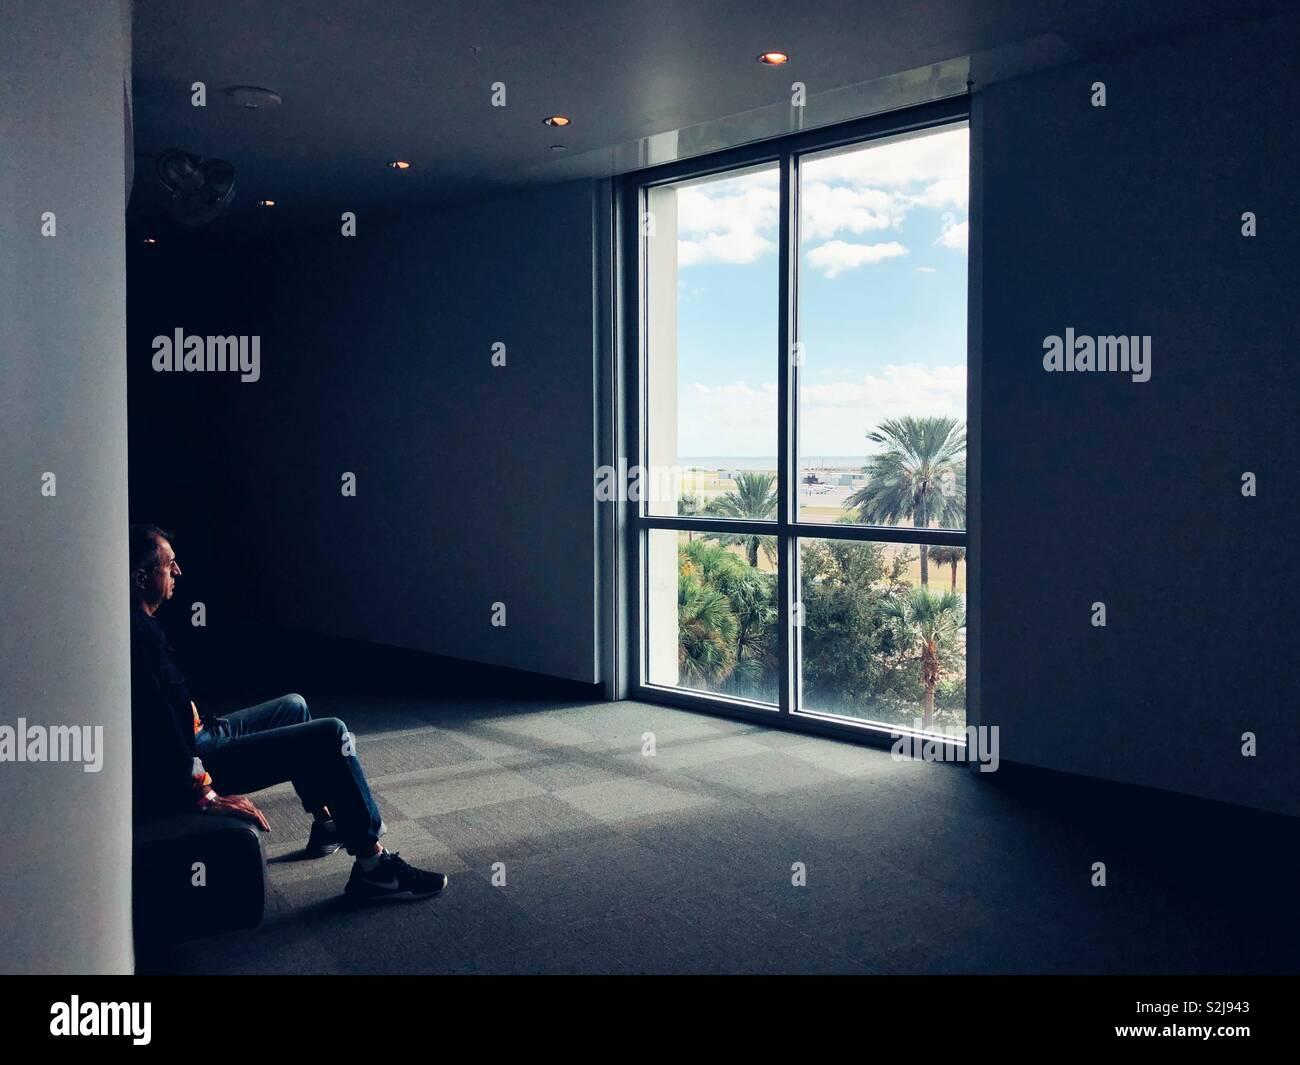 Mann verloren in Gedanken in Kontemplation Zimmer in Salvador Dali Museum in St. Petersburg, Florida sitzen Stockbild